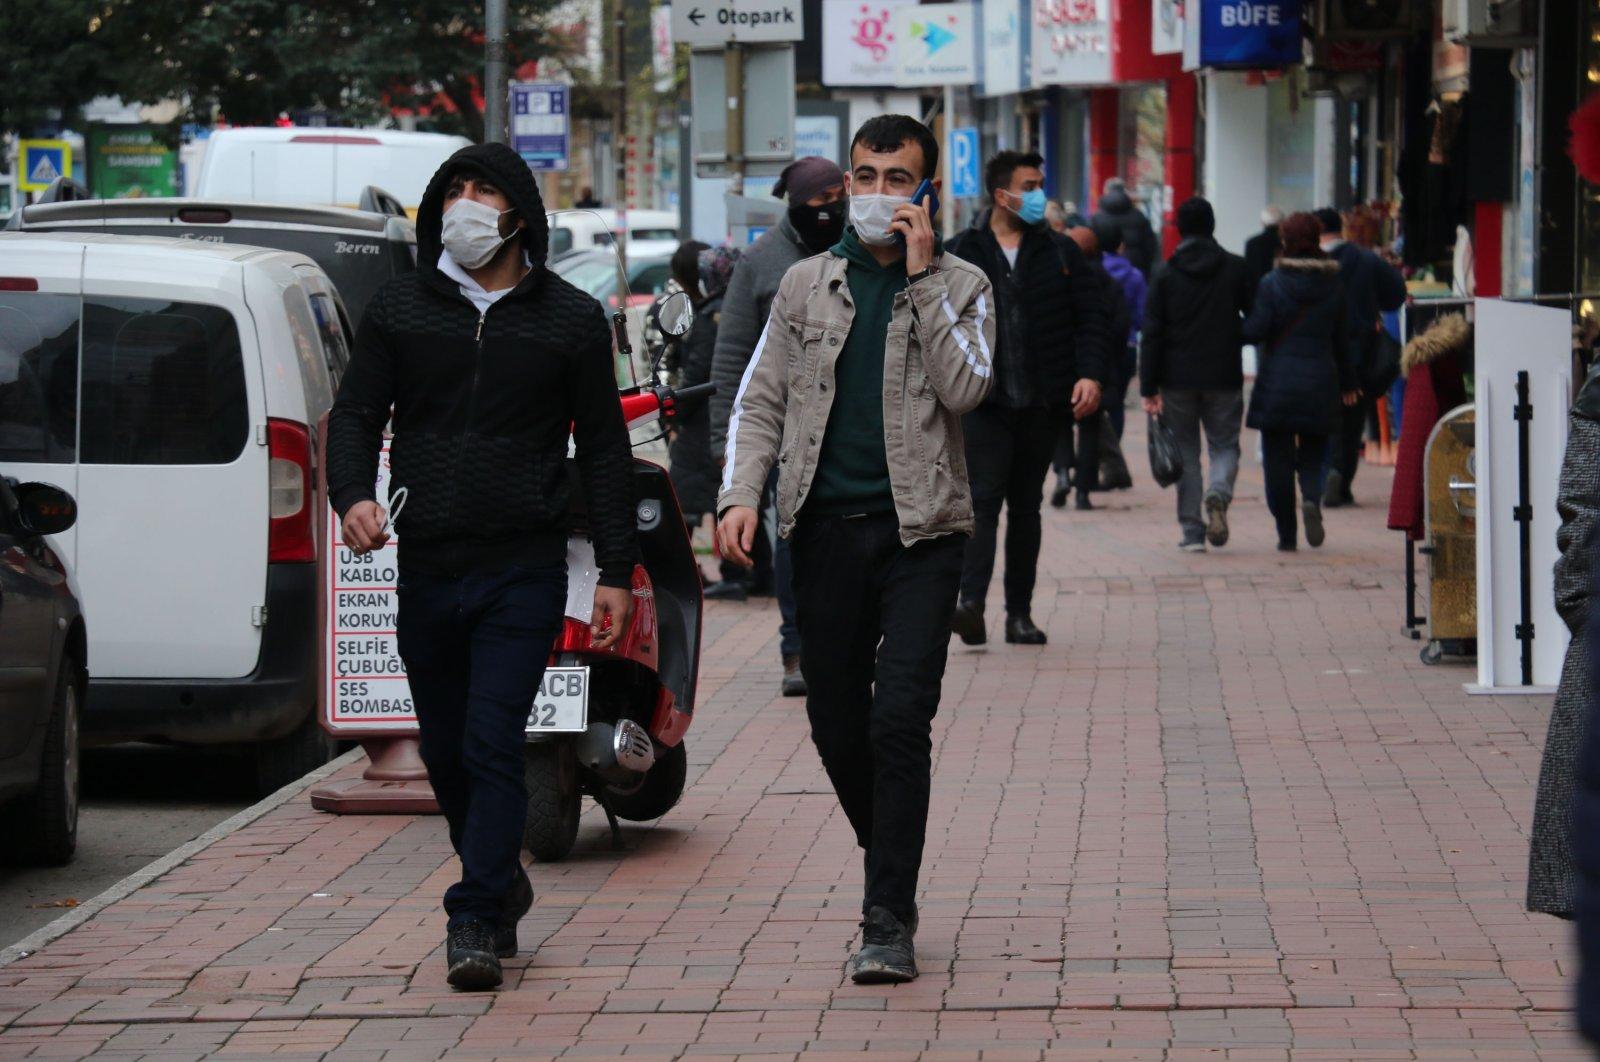 People wearing protective masks walk on a street in Samsun, northern Turkey, Dec. 22, 2020. (DHA Photo)